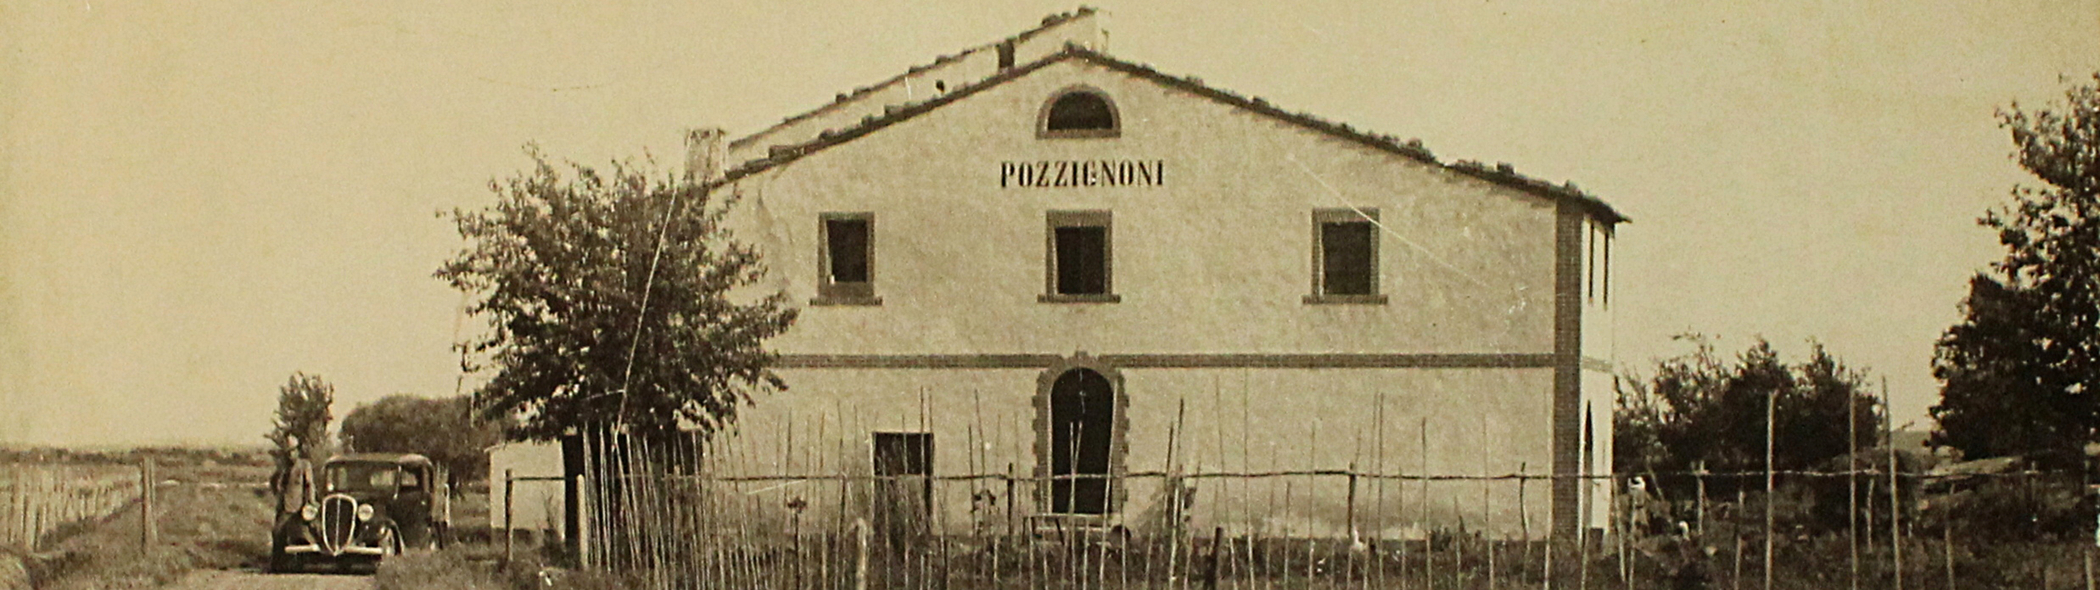 (Italiano) Agriturismo Pavone - Chi siamo